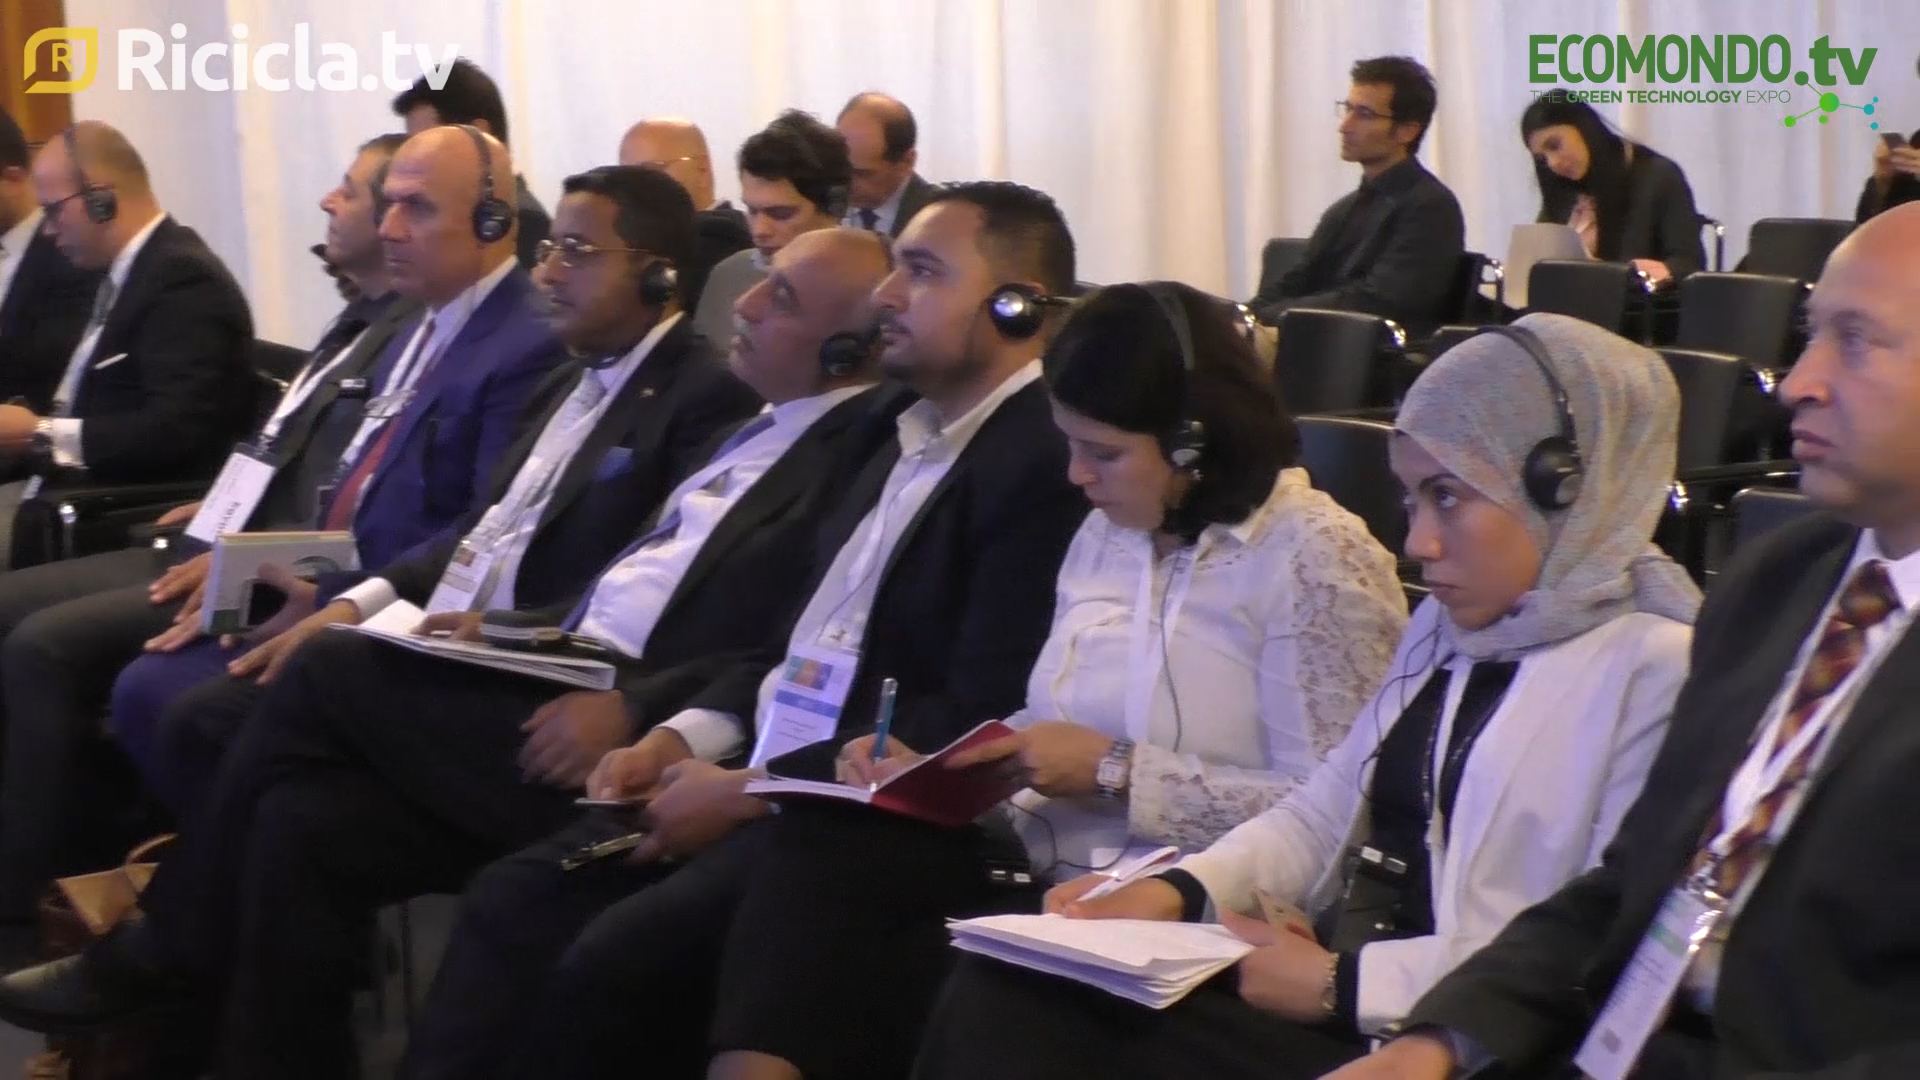 ECOMONDO 2019 - BUSINESS FORUM ITALY-EGYPT